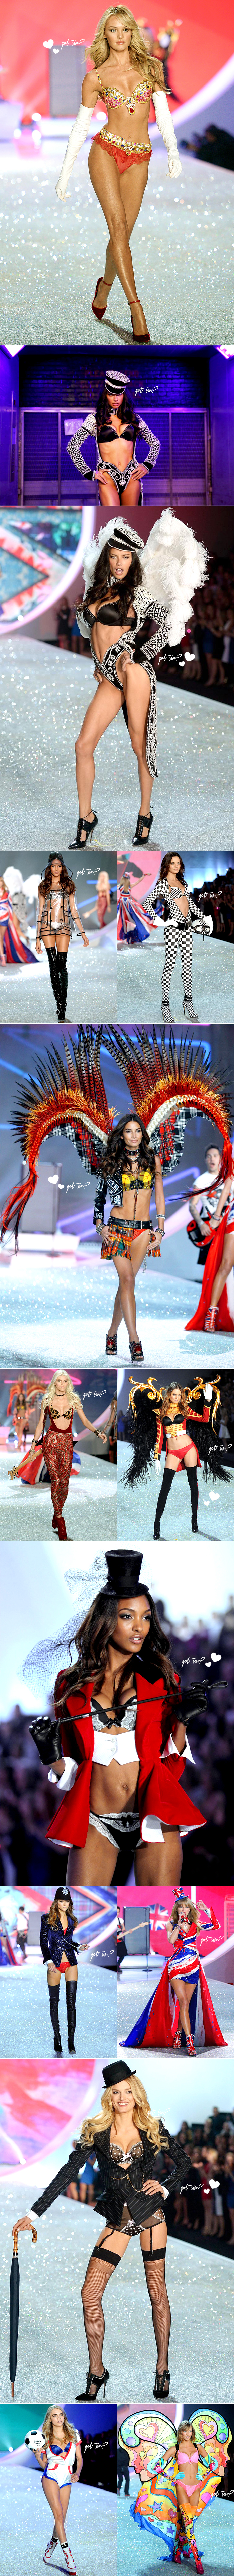 desfile-victorias-secret-fashion-show-blog-got-sin-alessandra-ambrosio-doutzen-kroes-candice-swanepoel-sexy-lingerie-sutia-milionario-diamantes-inglaterra-taylor-swift-01